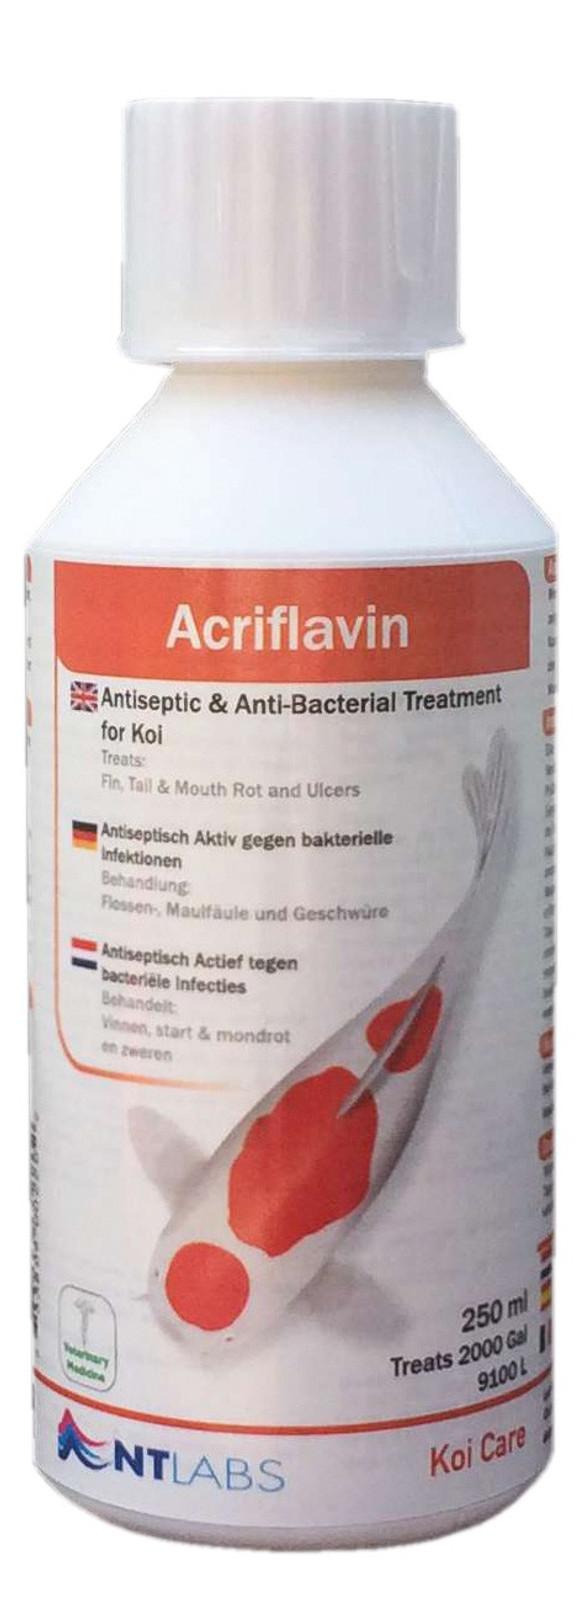 Koi Care Acriflavin, 500 ml - Antiseptikum gegen Bakterien